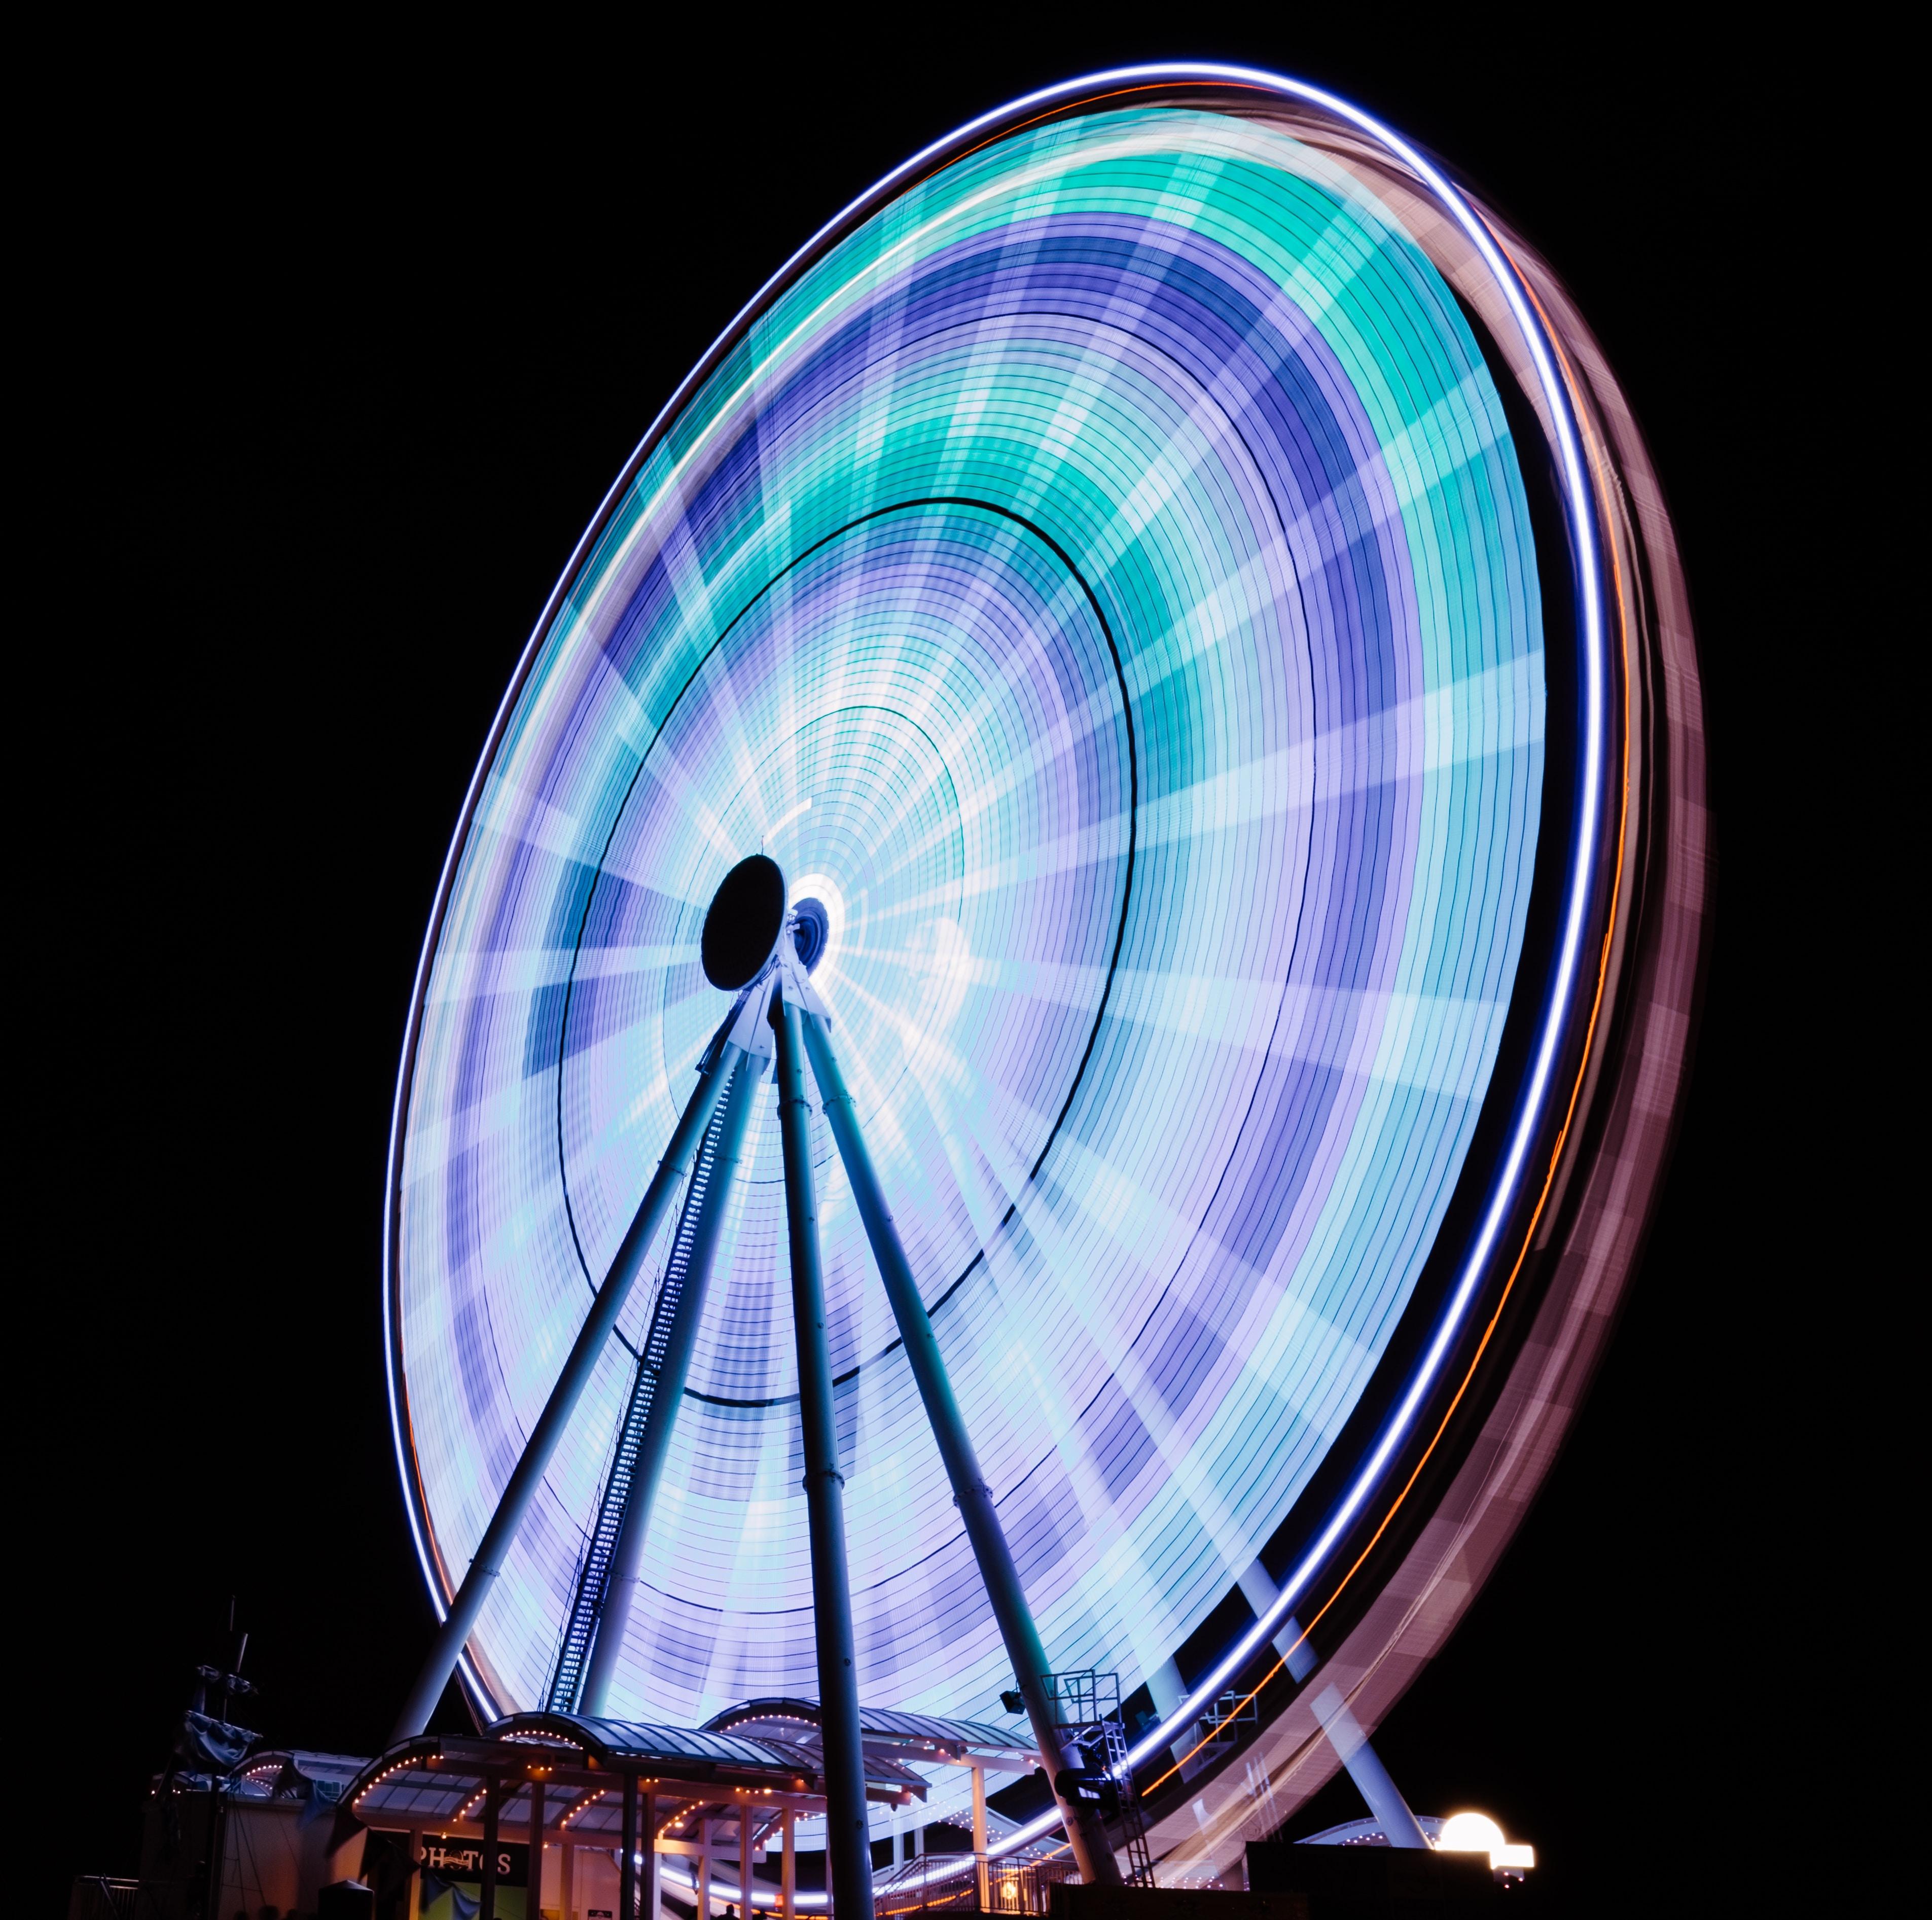 timelapse photography of ferris wheel